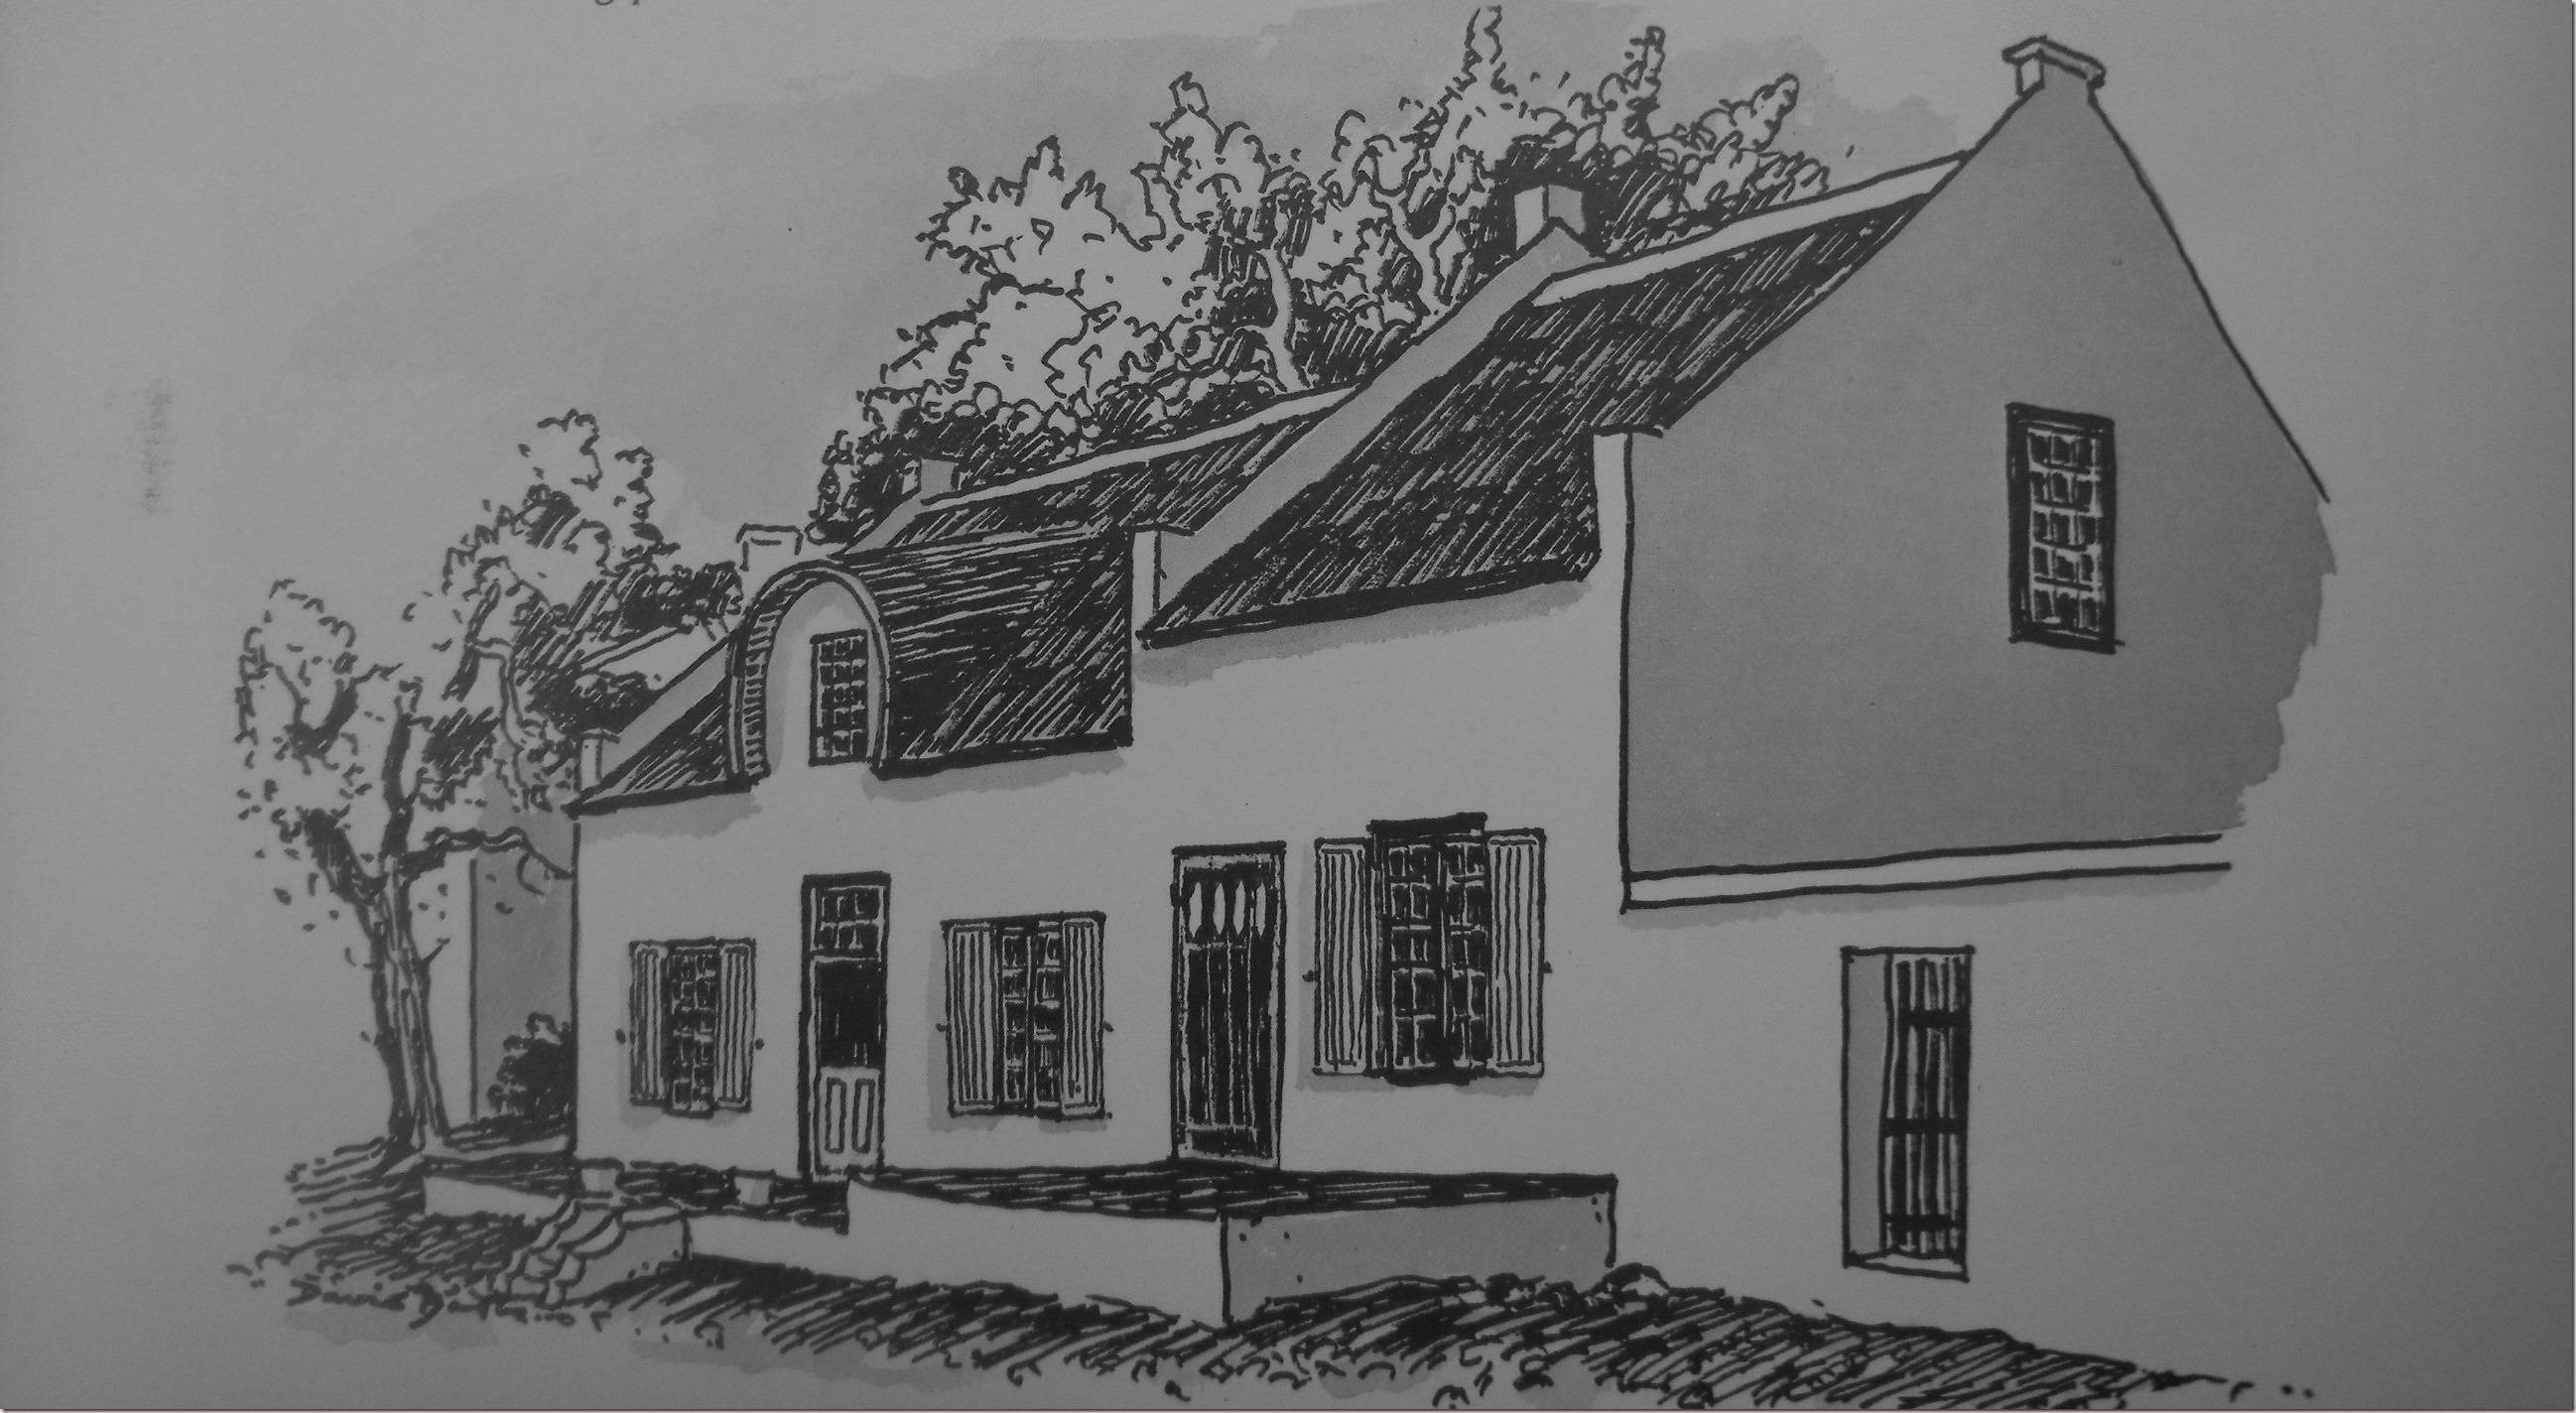 Huis Wolfaardt - David Botha